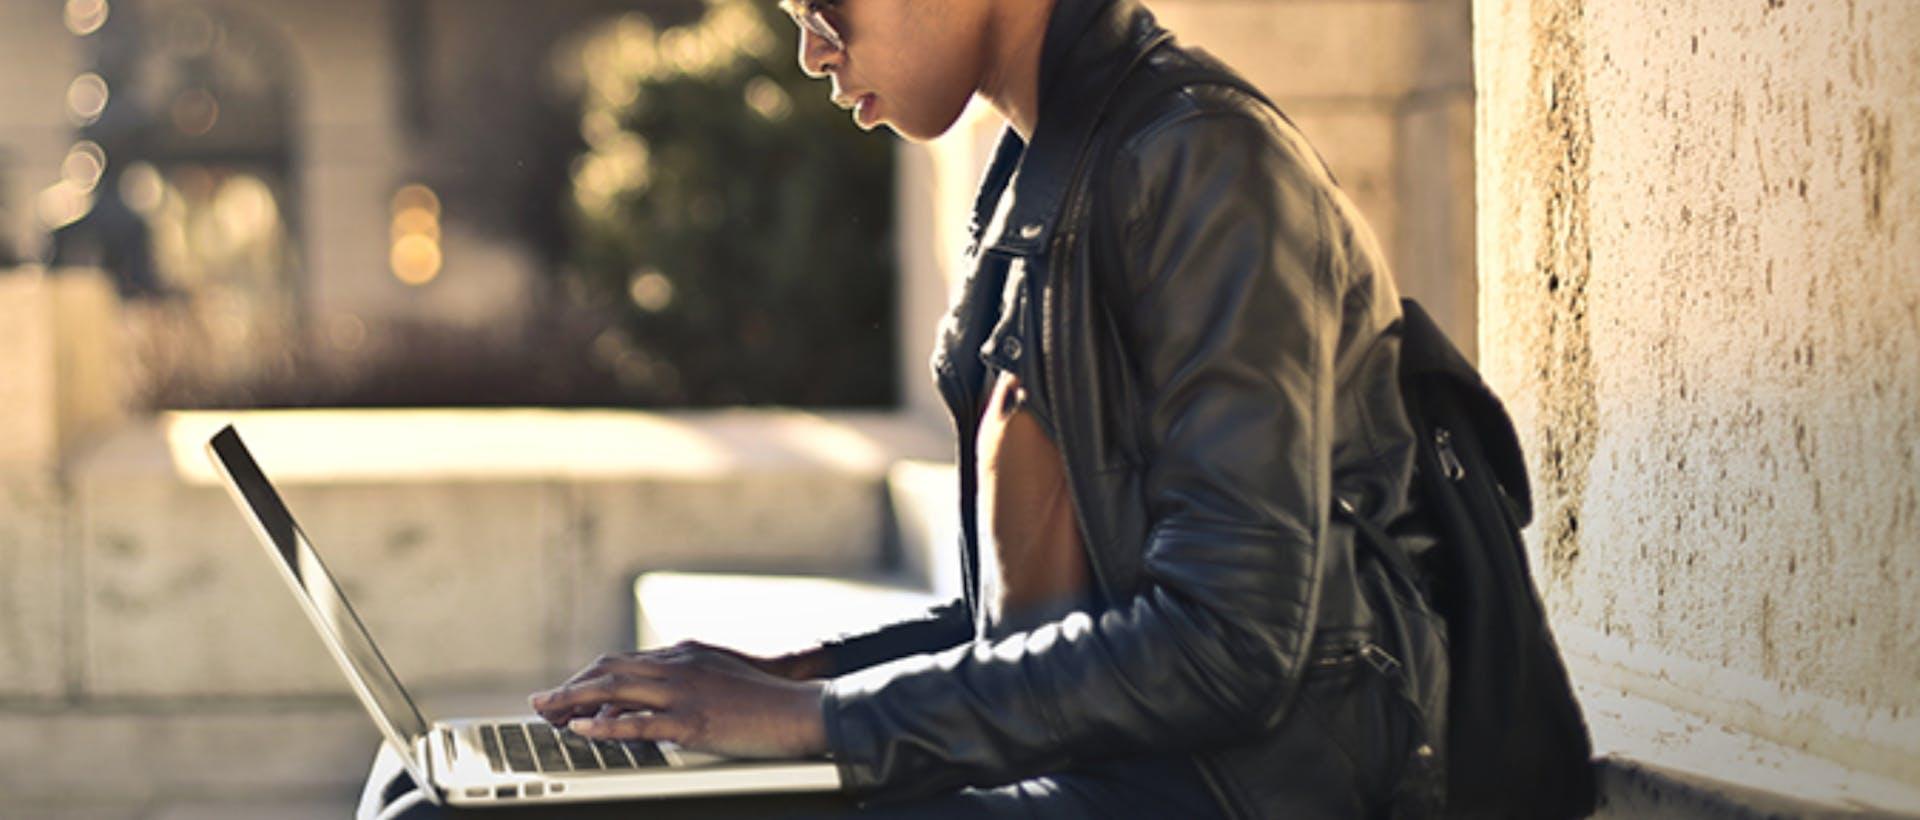 writing skills matter for pr